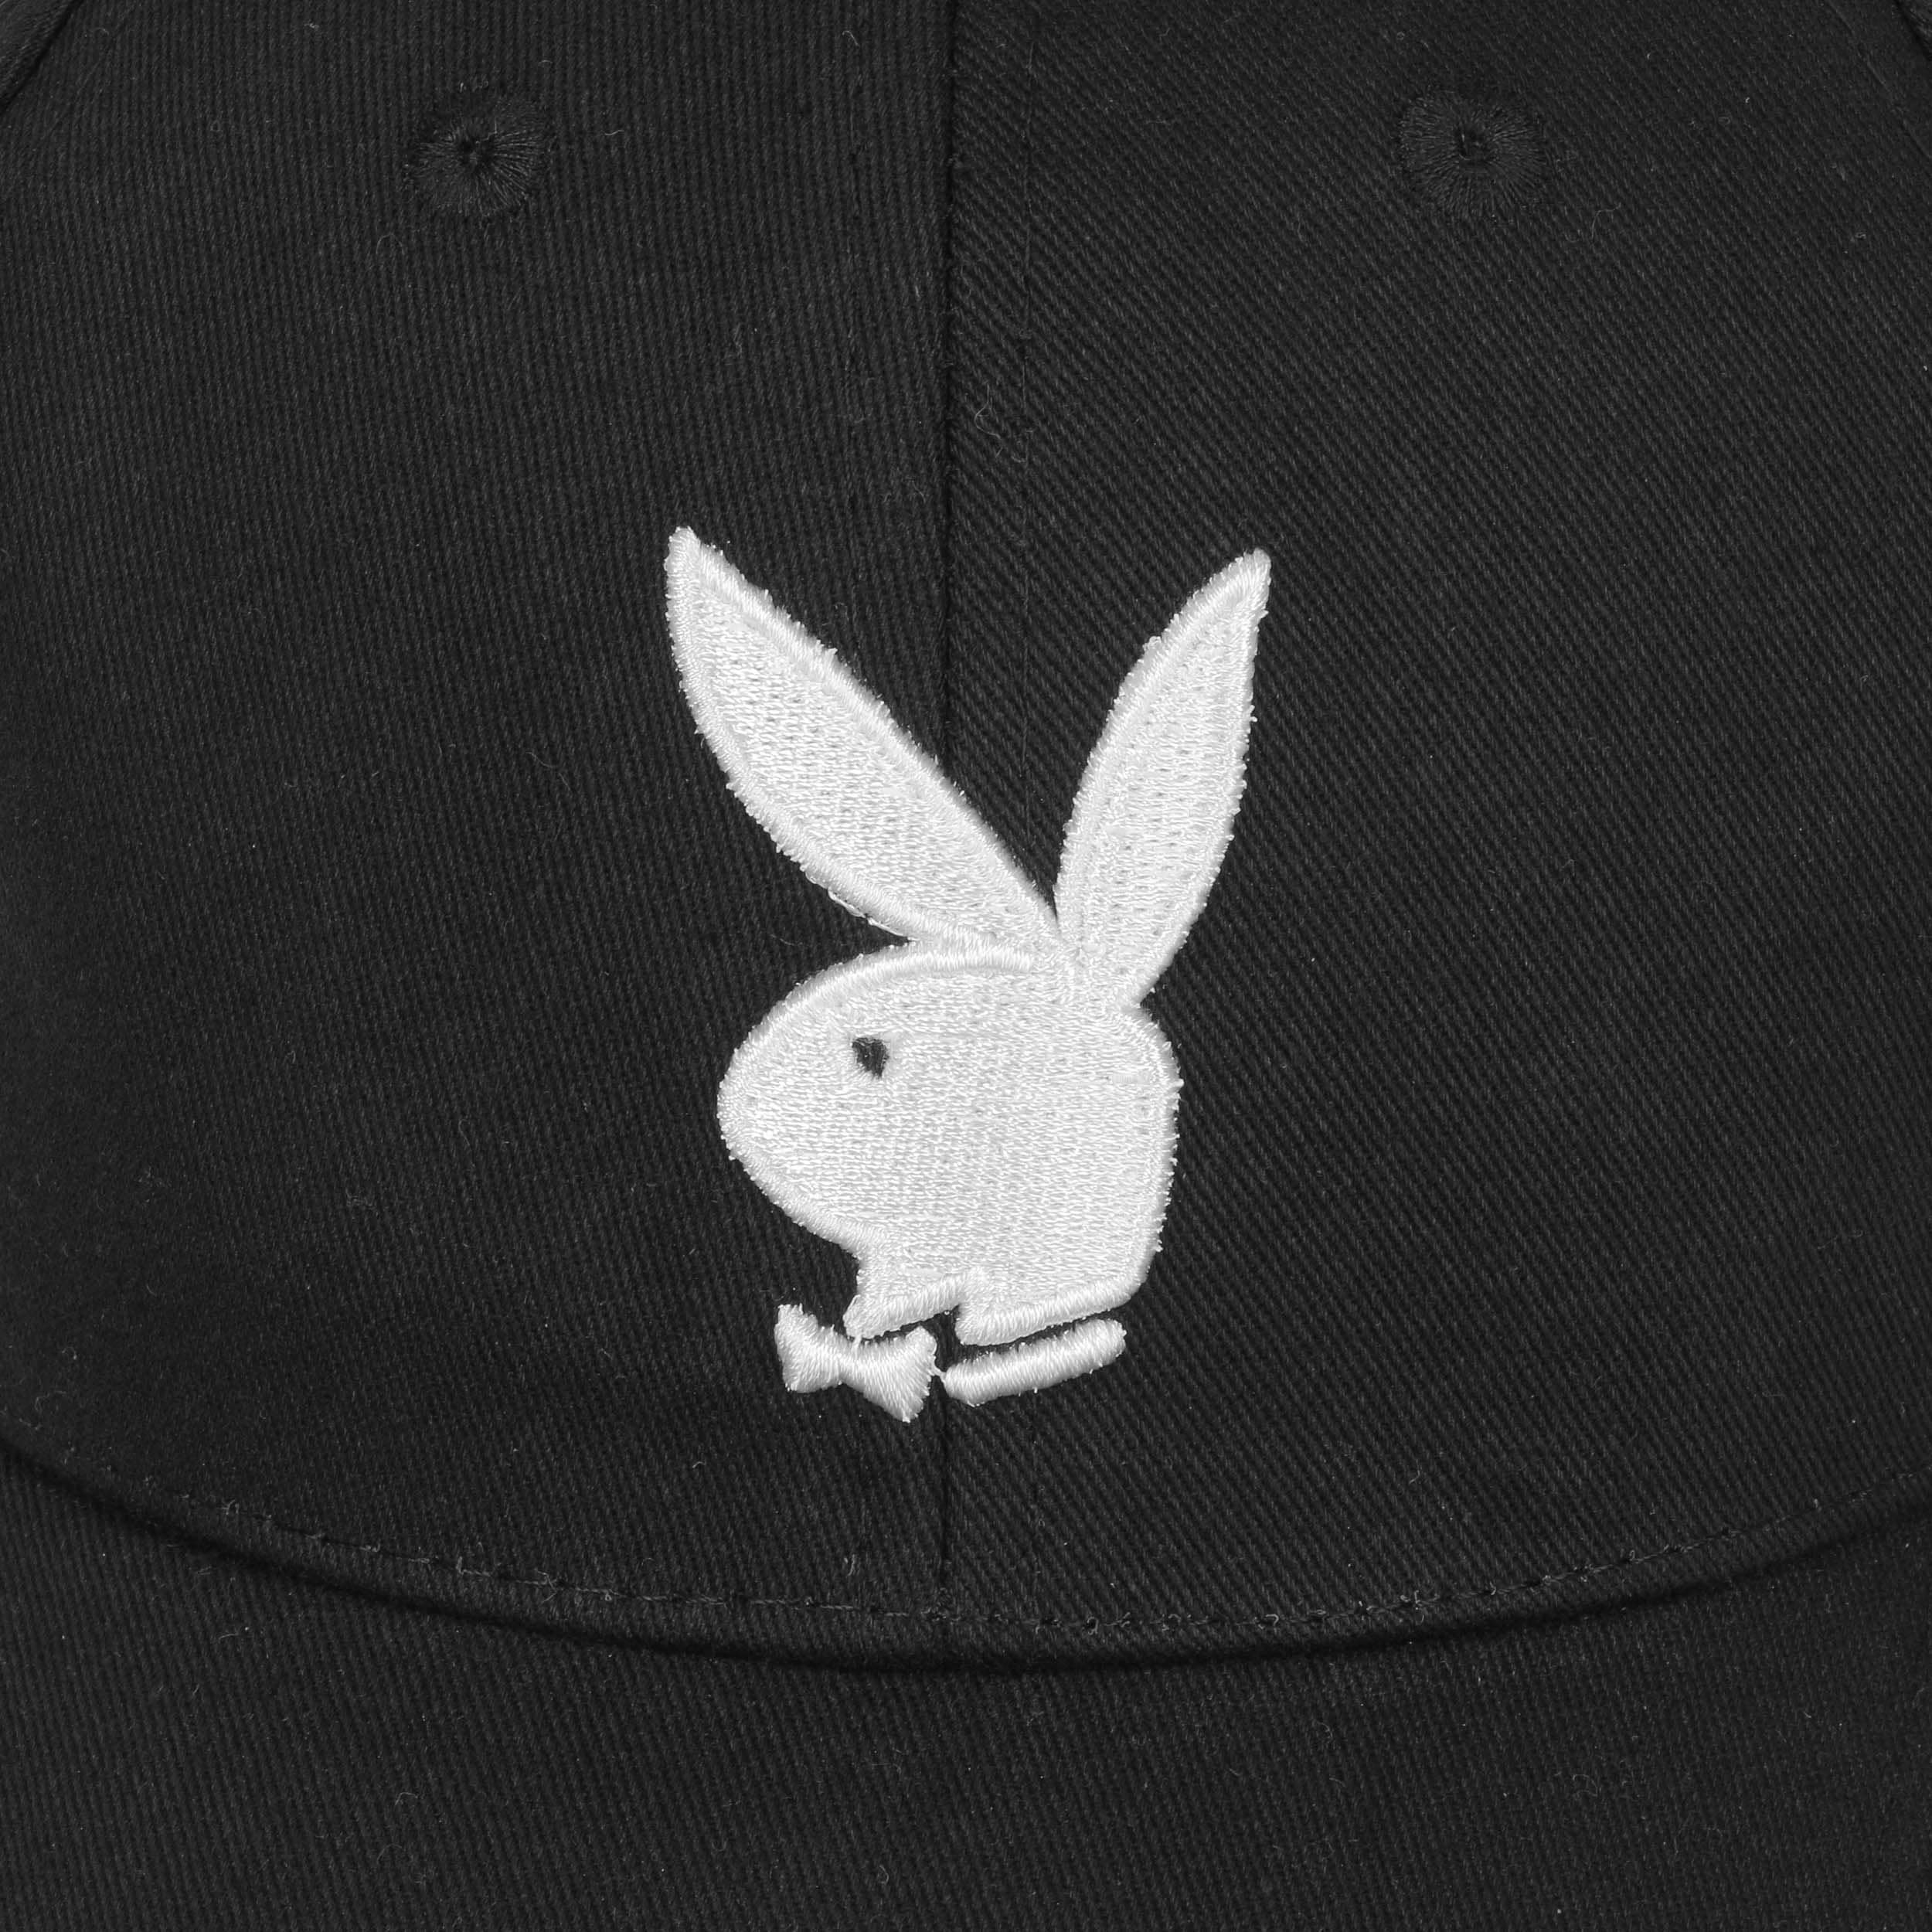 19 95 Classic Bunny Casquette Playboy j5ARL4